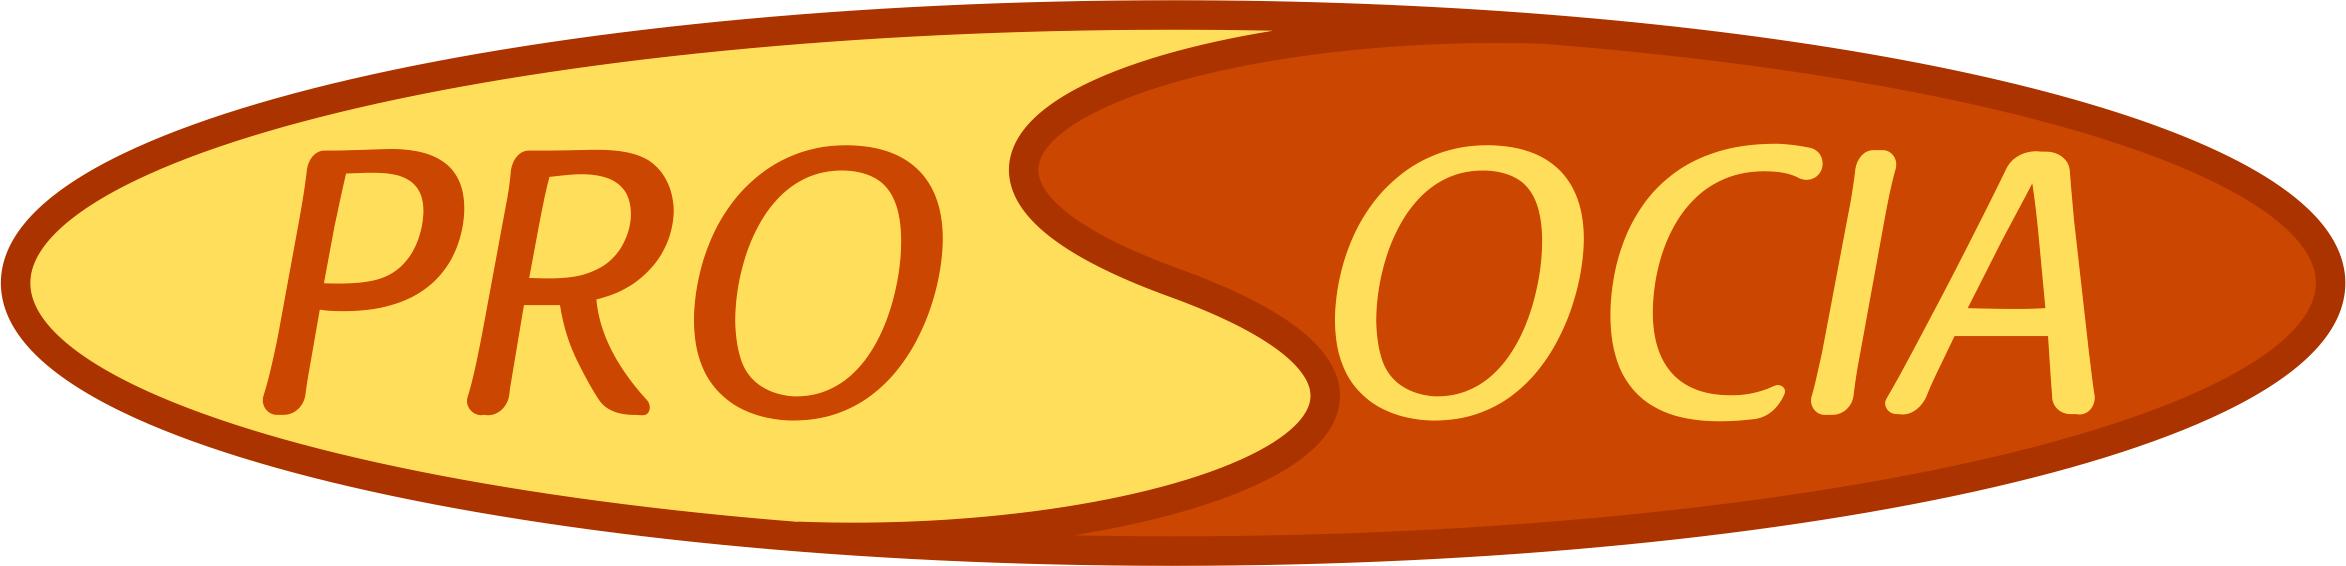 Prosocia